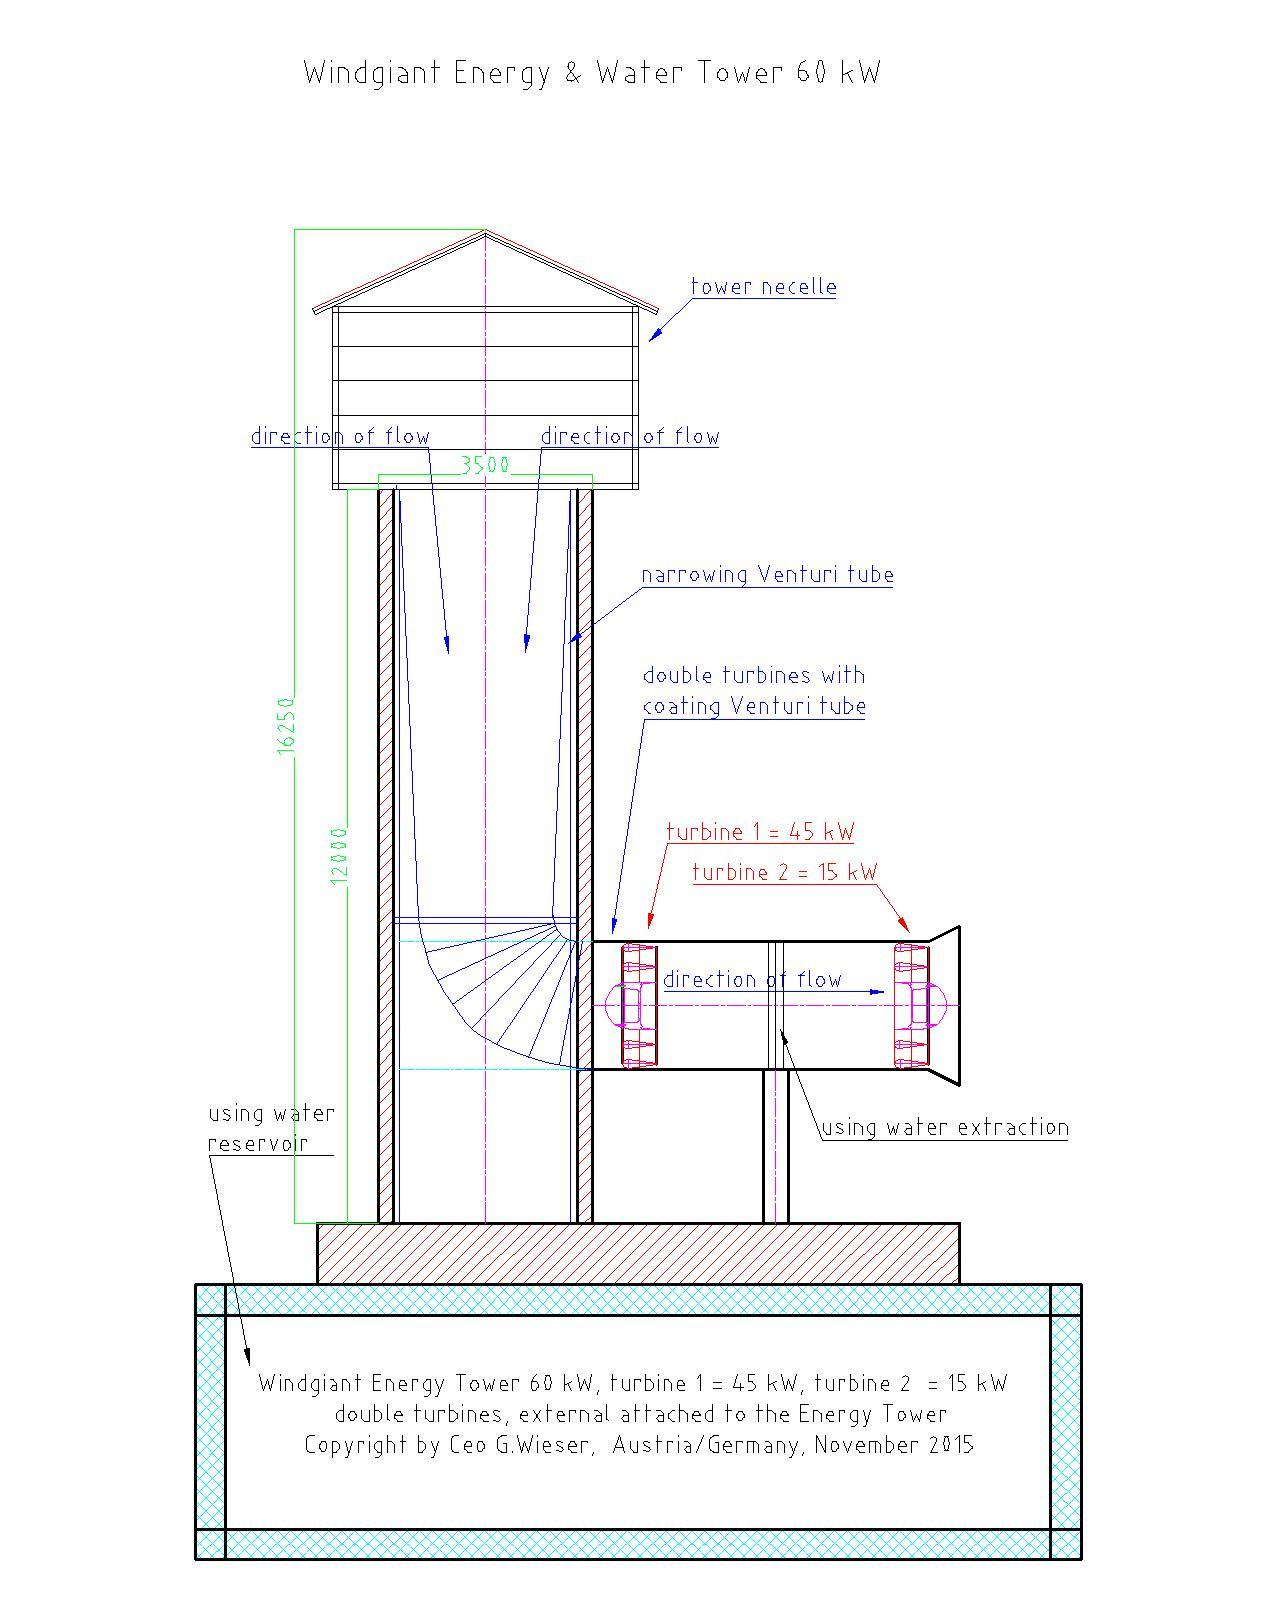 Energytower_60_kW_23.11.2015